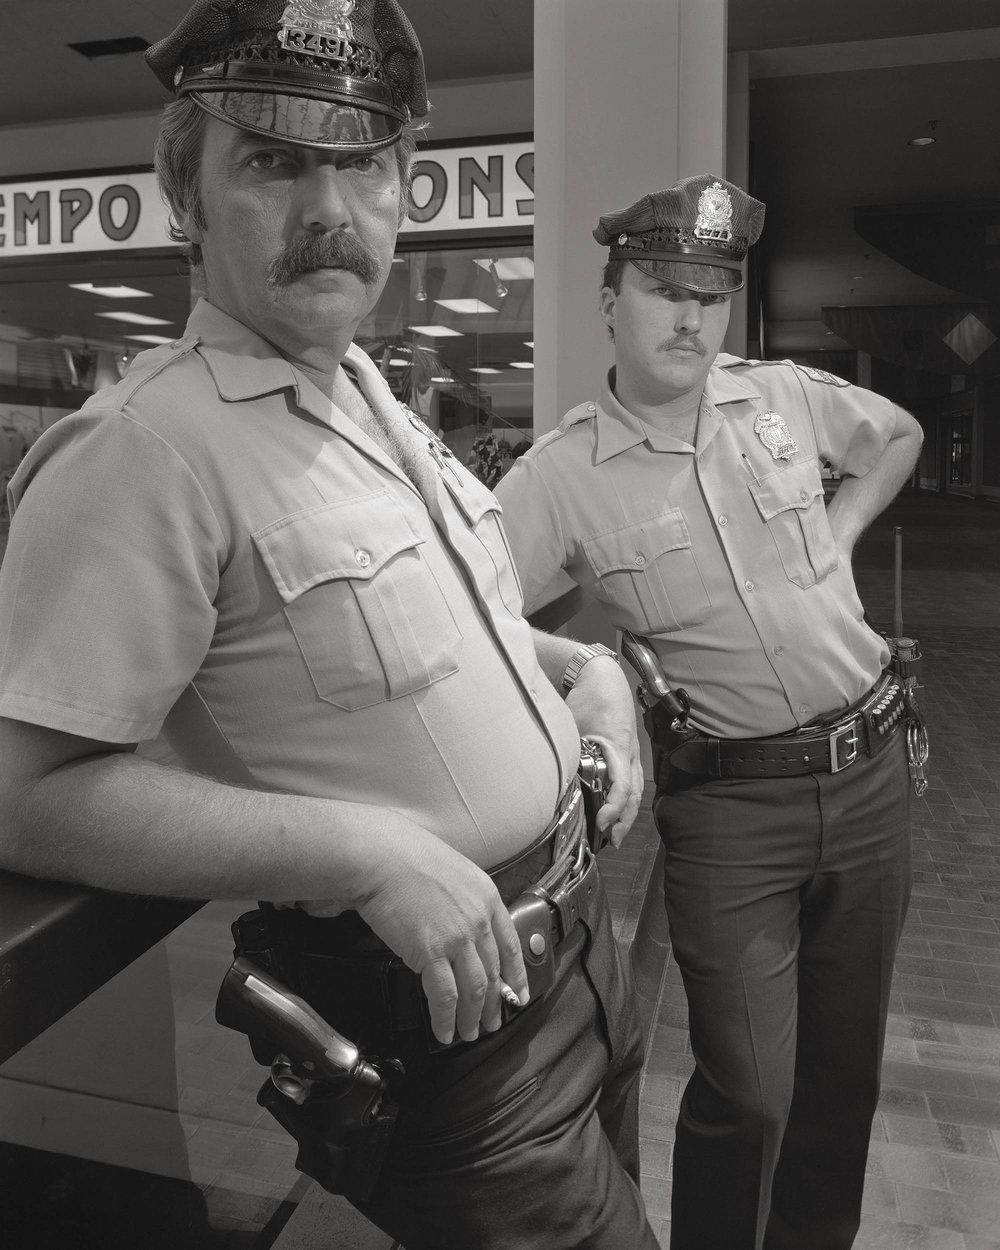 "Galleria Police, Saturday Morning - 8""x 10"" large-format, 1986, © Stephen DiRado"